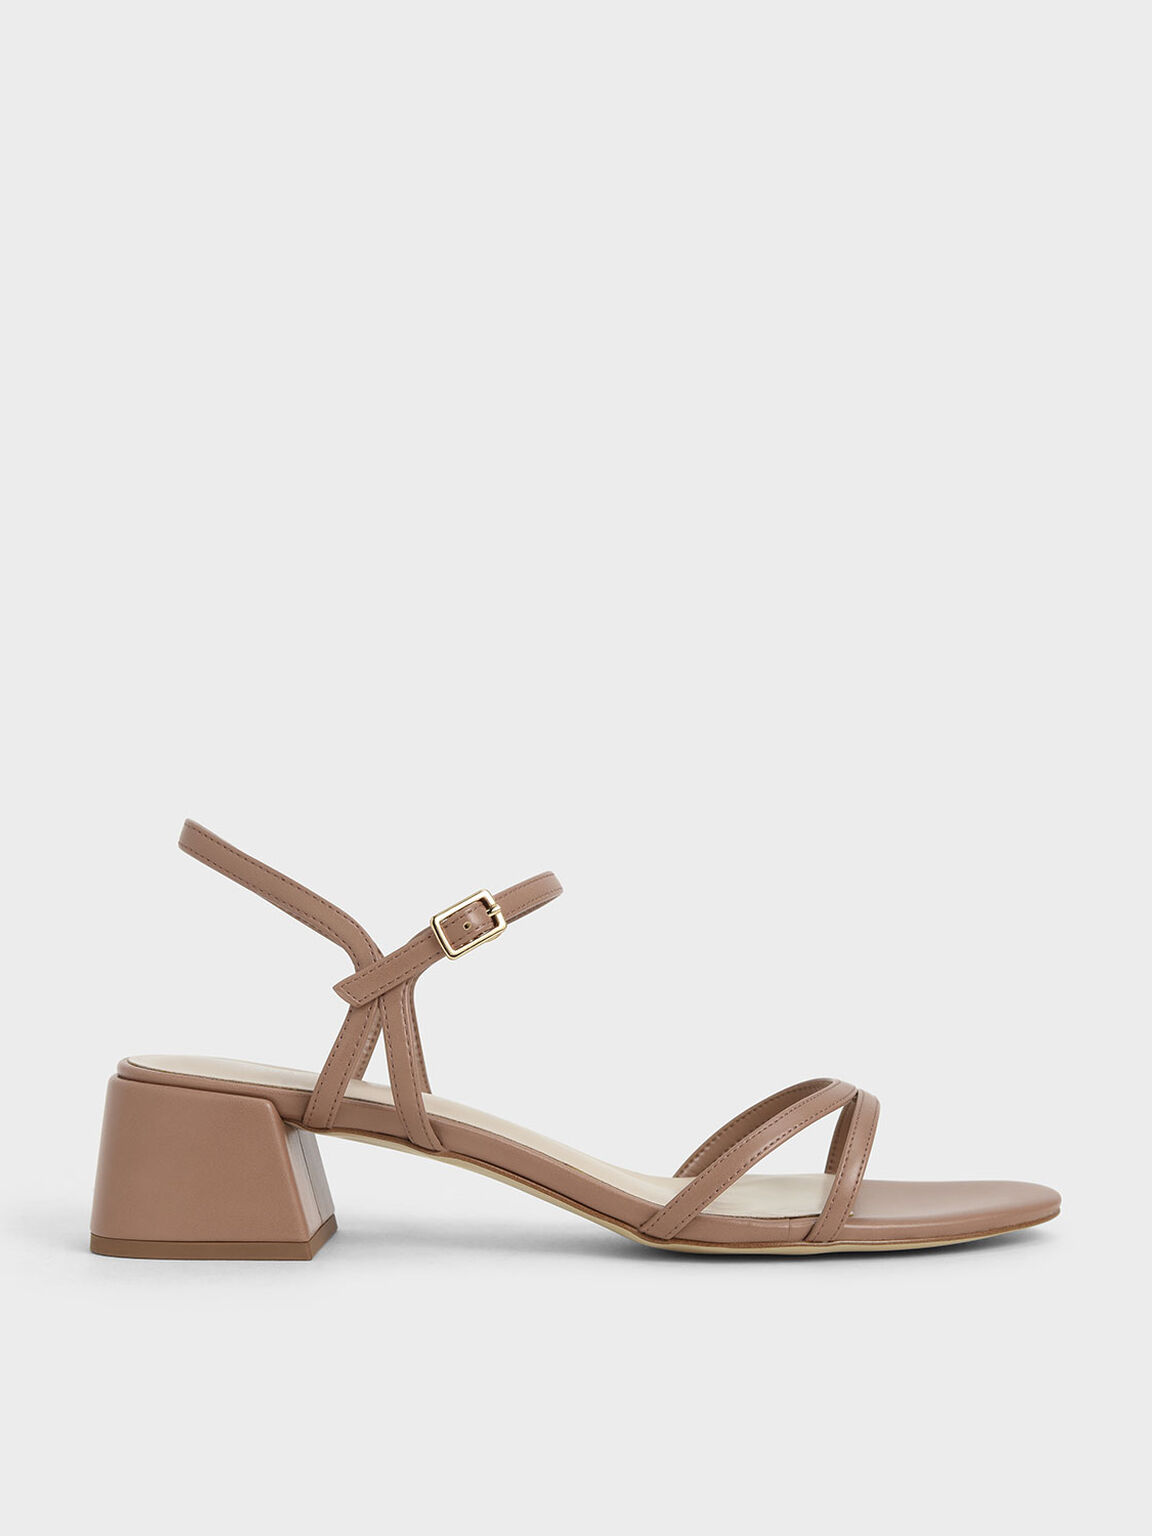 Sandal Strappy Block Heel, Tan, hi-res